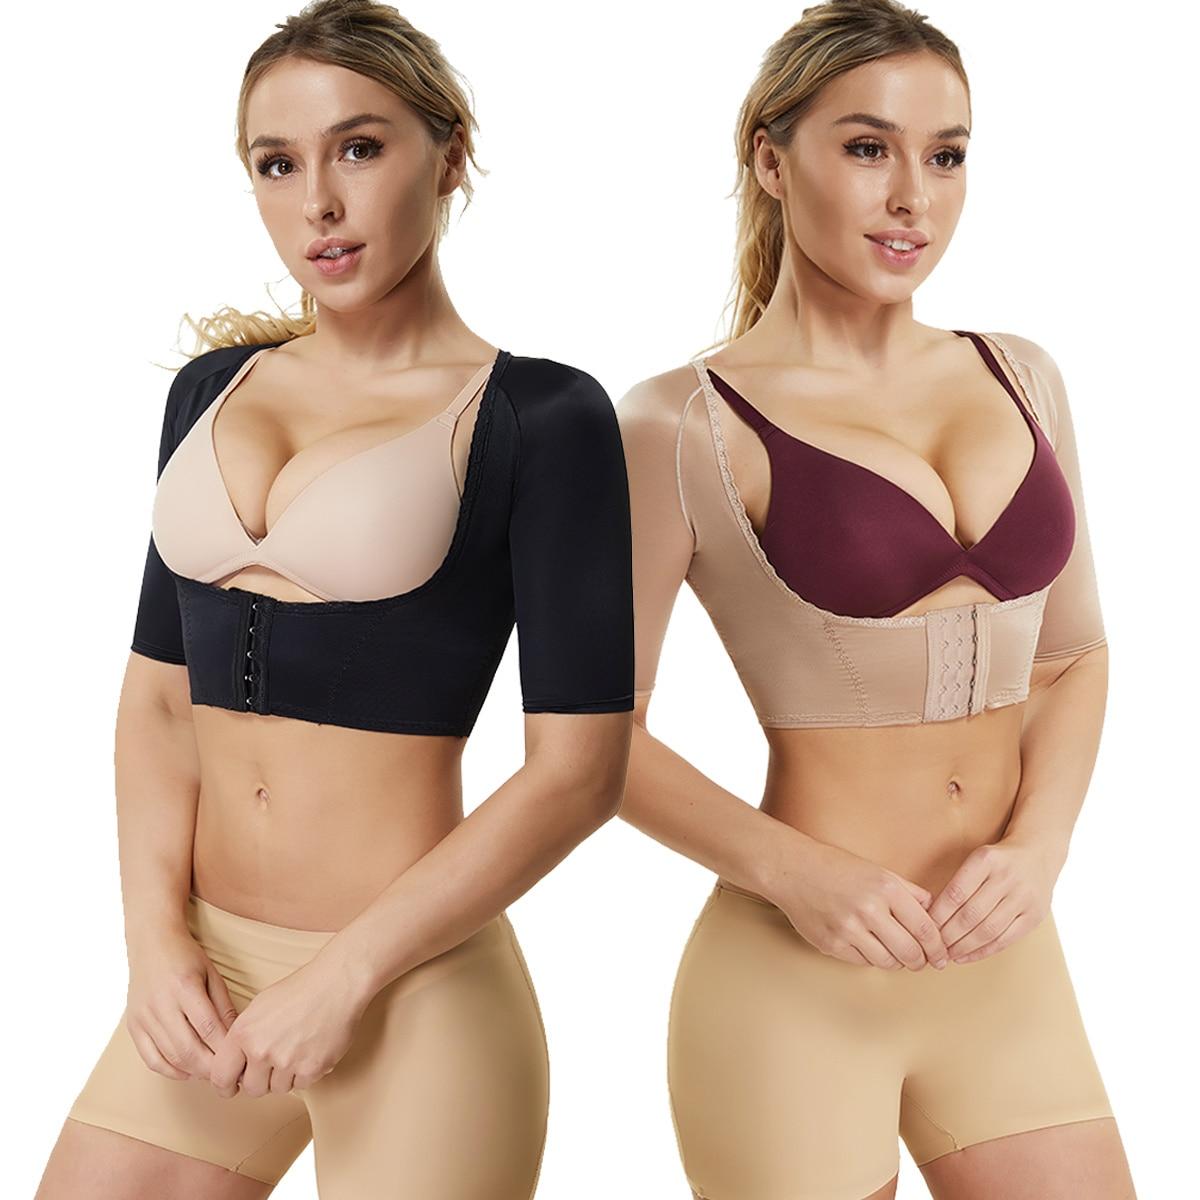 Joyshaper Chest Brace Up Women Posture Corrector Shapewear Breast Back Support X Strap Bra Support Shaper Vest Tops